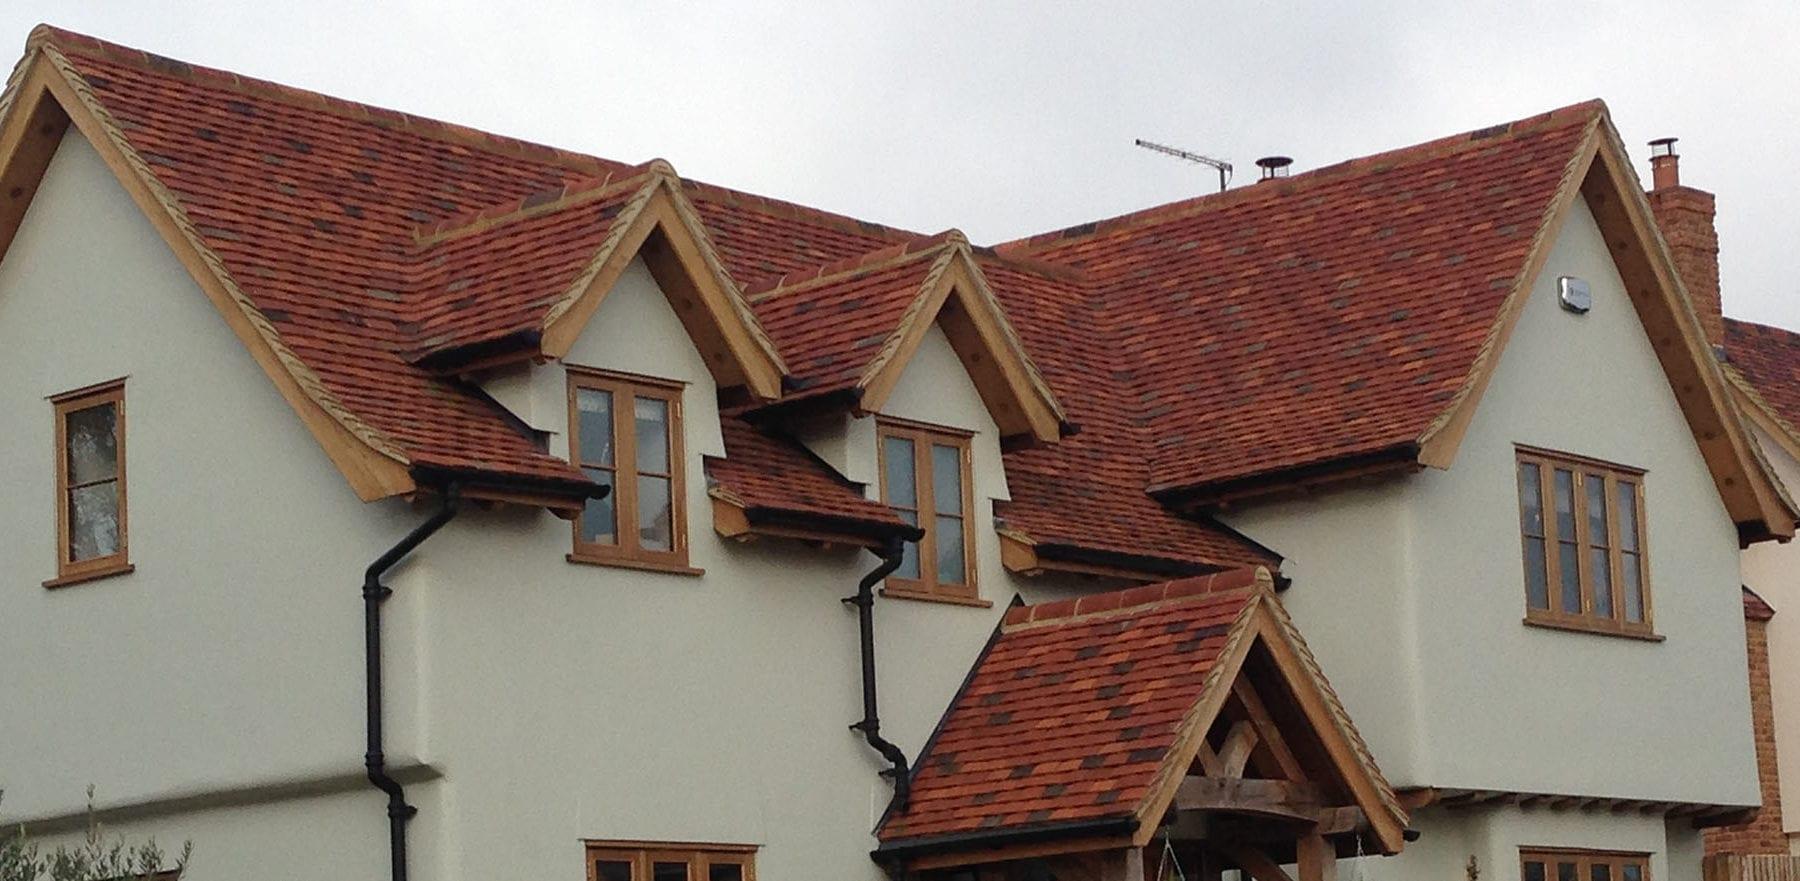 Lifestiles - Handmade Multi Clay Roof Tiles - Manuden, England 5